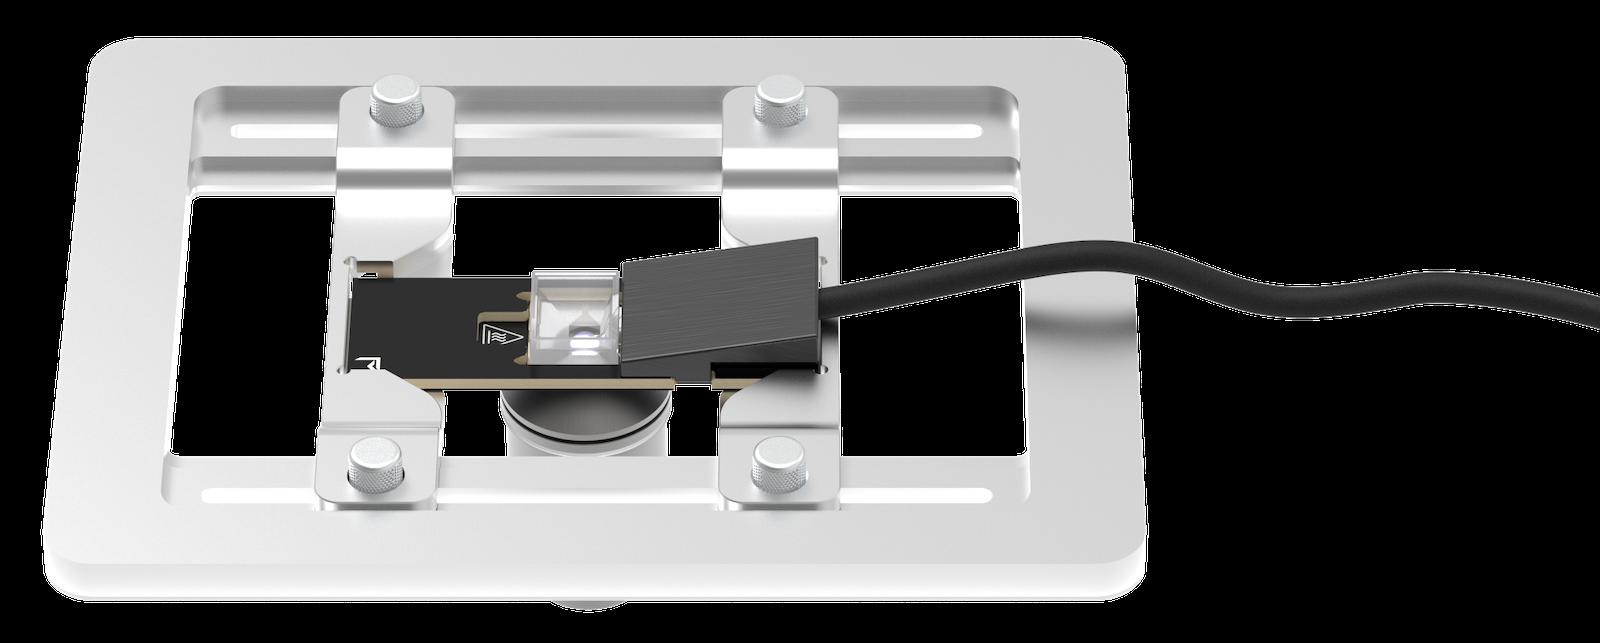 VAHEAT in microscope adapter